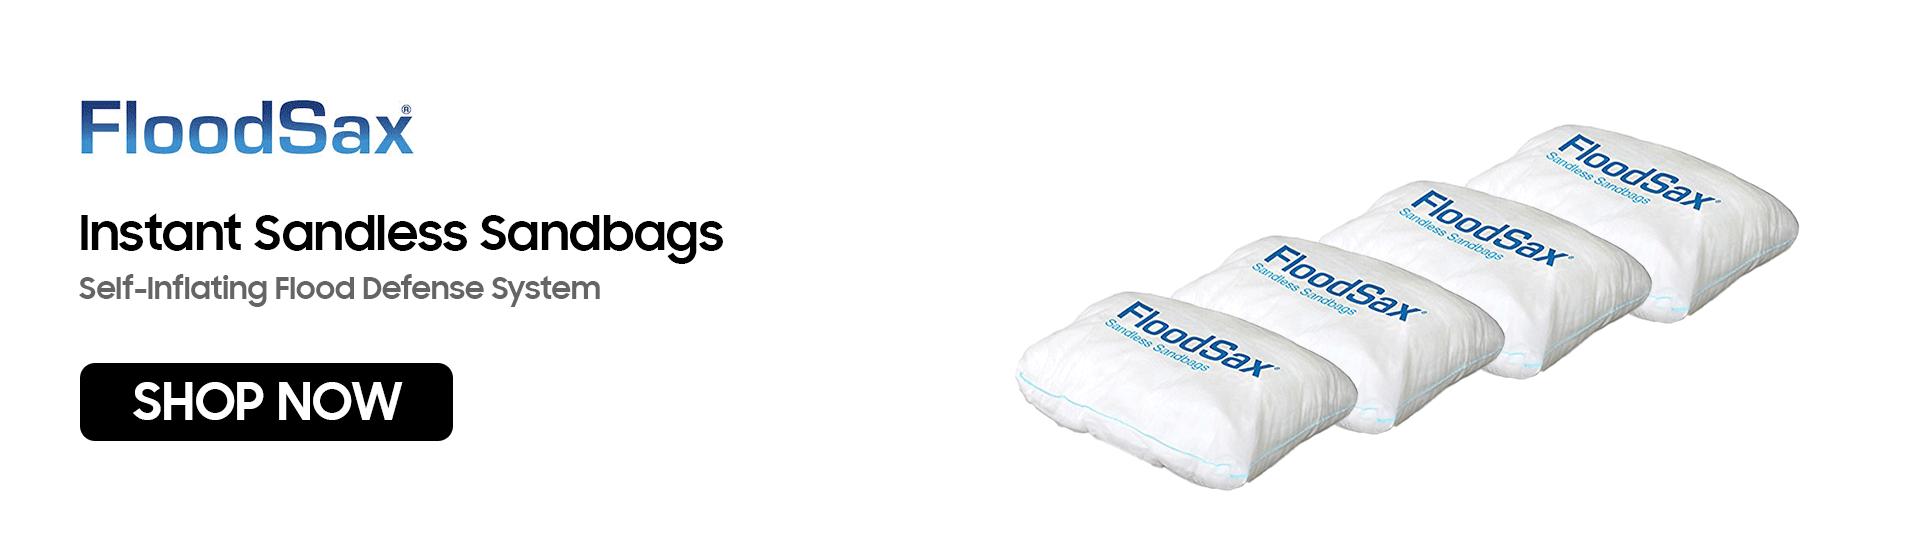 FloodSax | Instant Sandless Sandbags